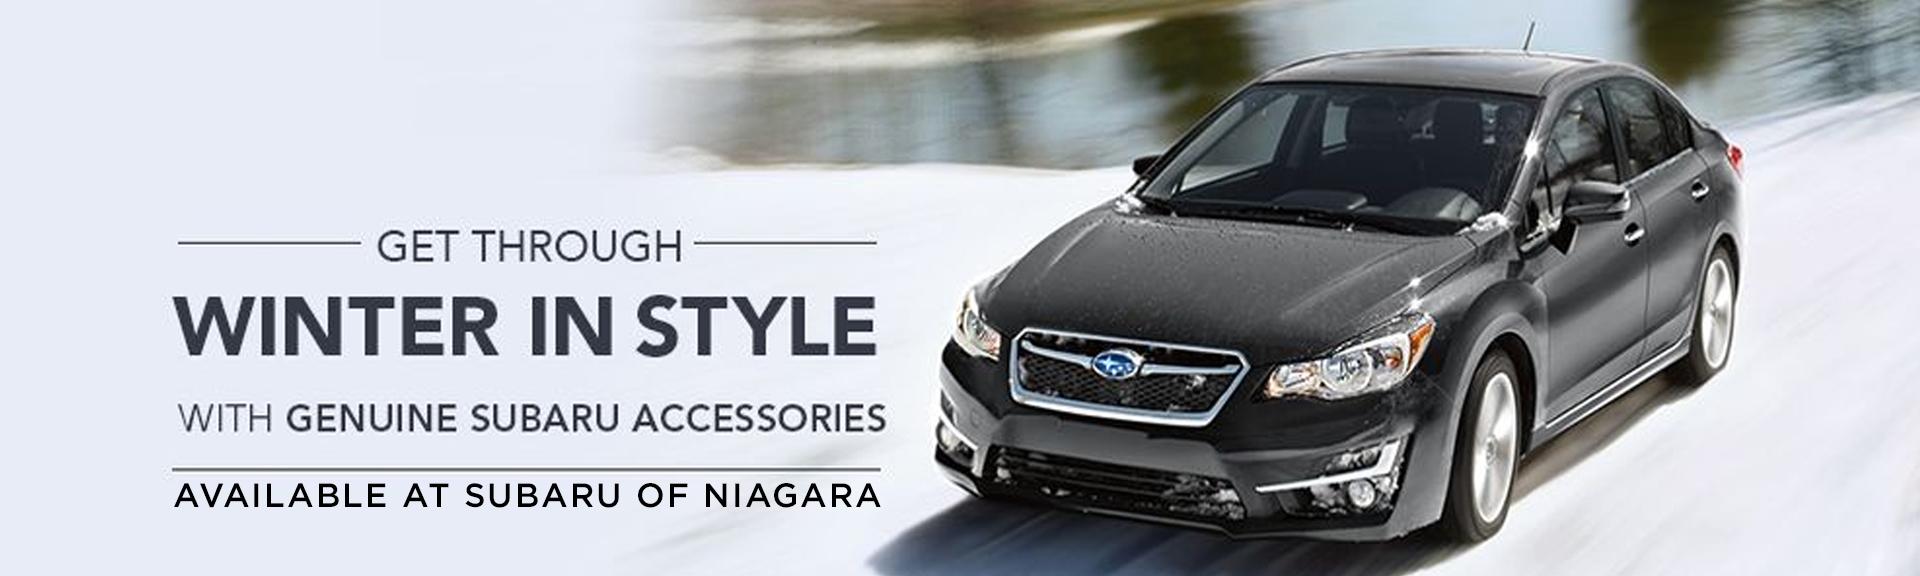 Get genuine Subaru accessories at Subaru of Niagara